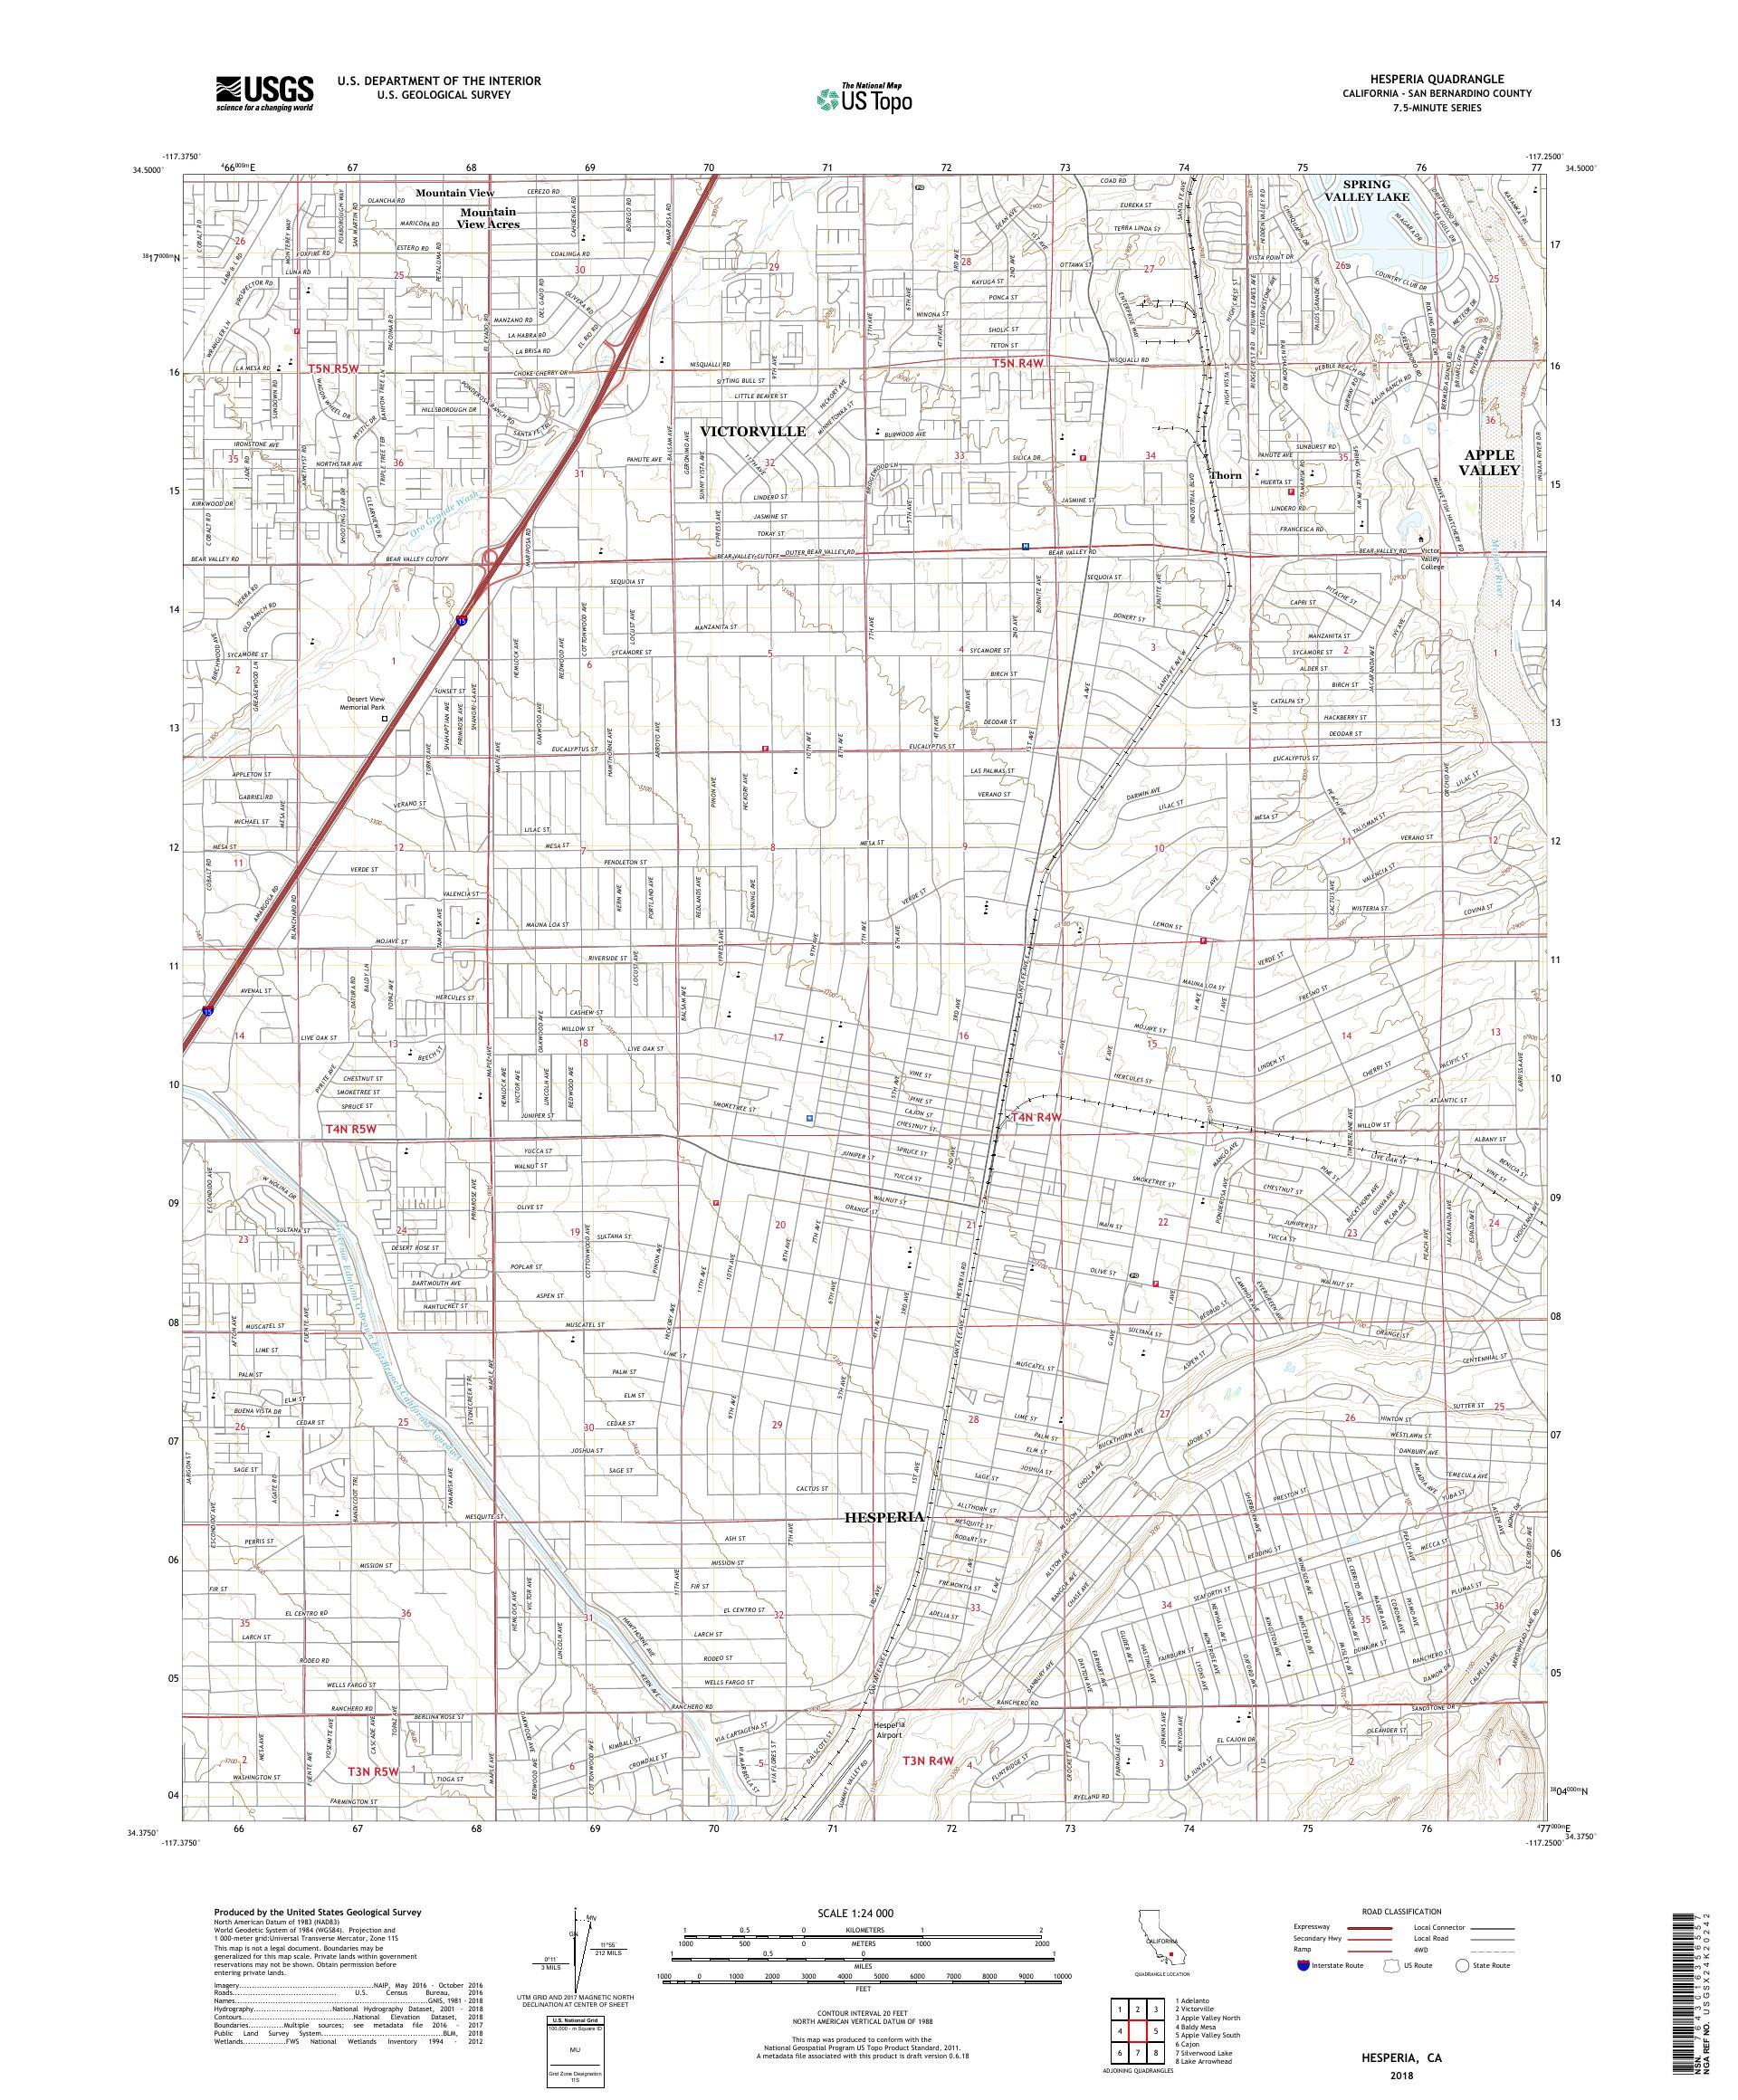 MyTopo Hesperia, California USGS Quad Topo Map